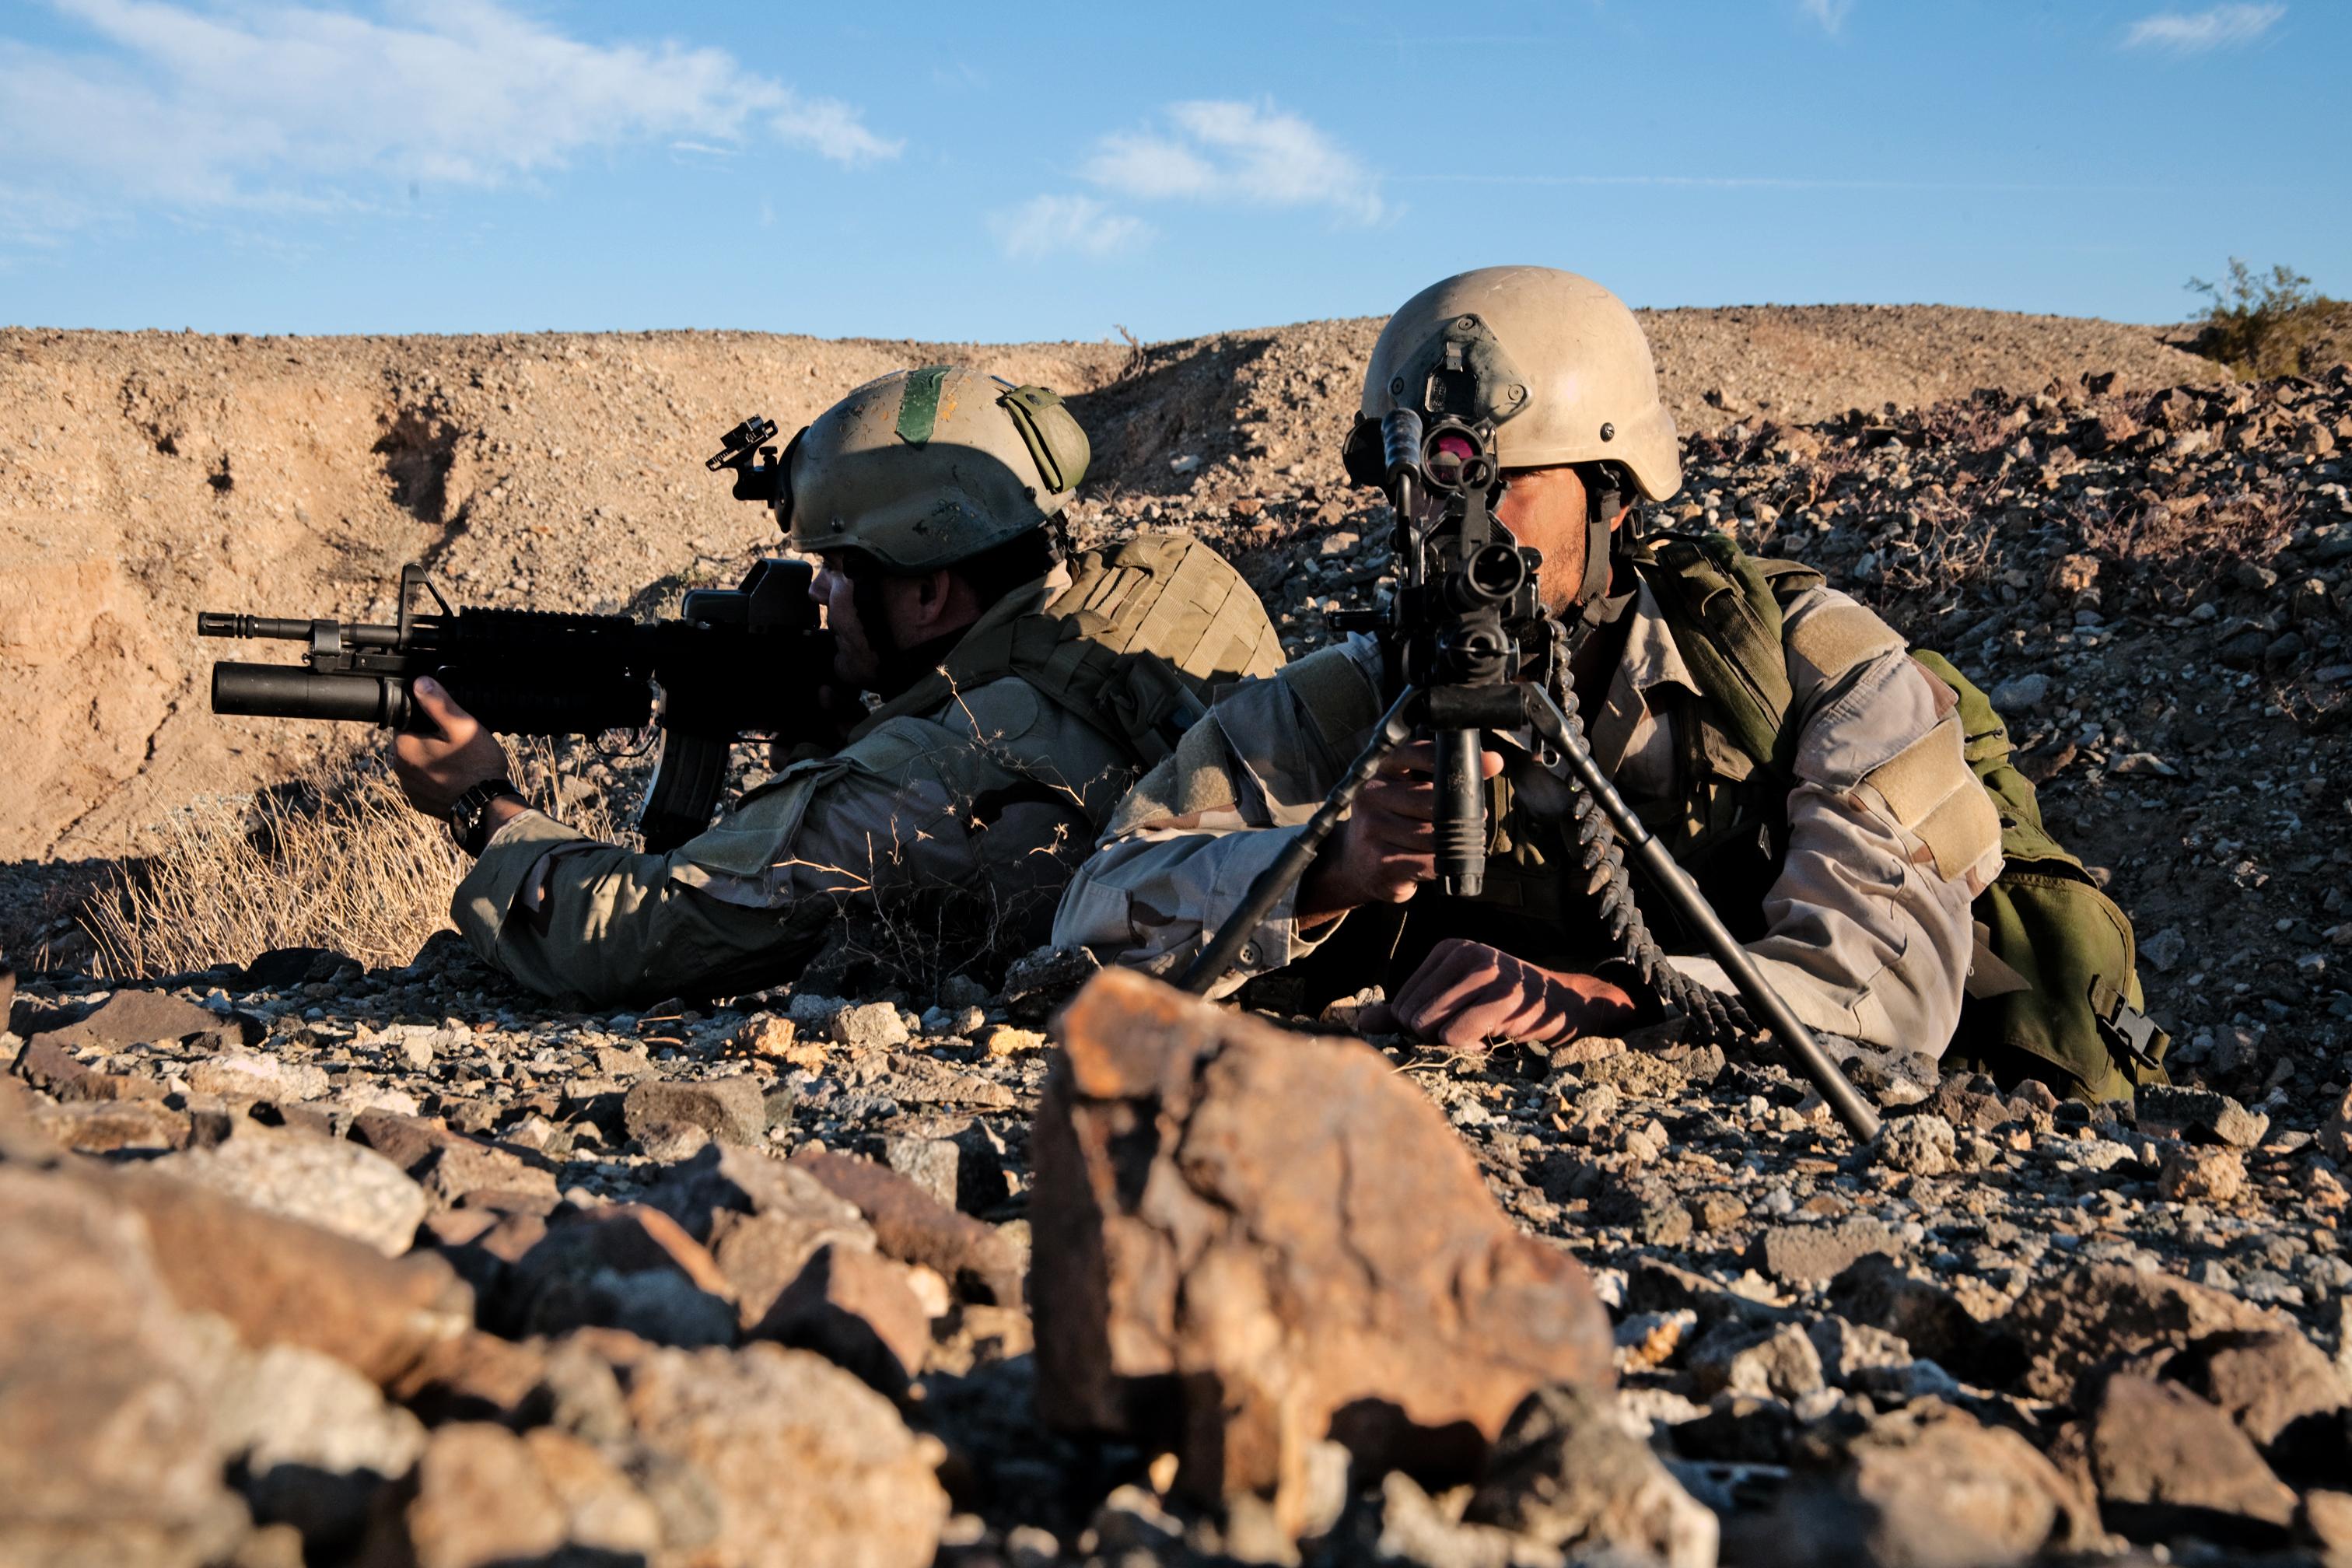 https://upload.wikimedia.org/wikipedia/commons/9/98/United_States_Navy_SEALs_319.jpg